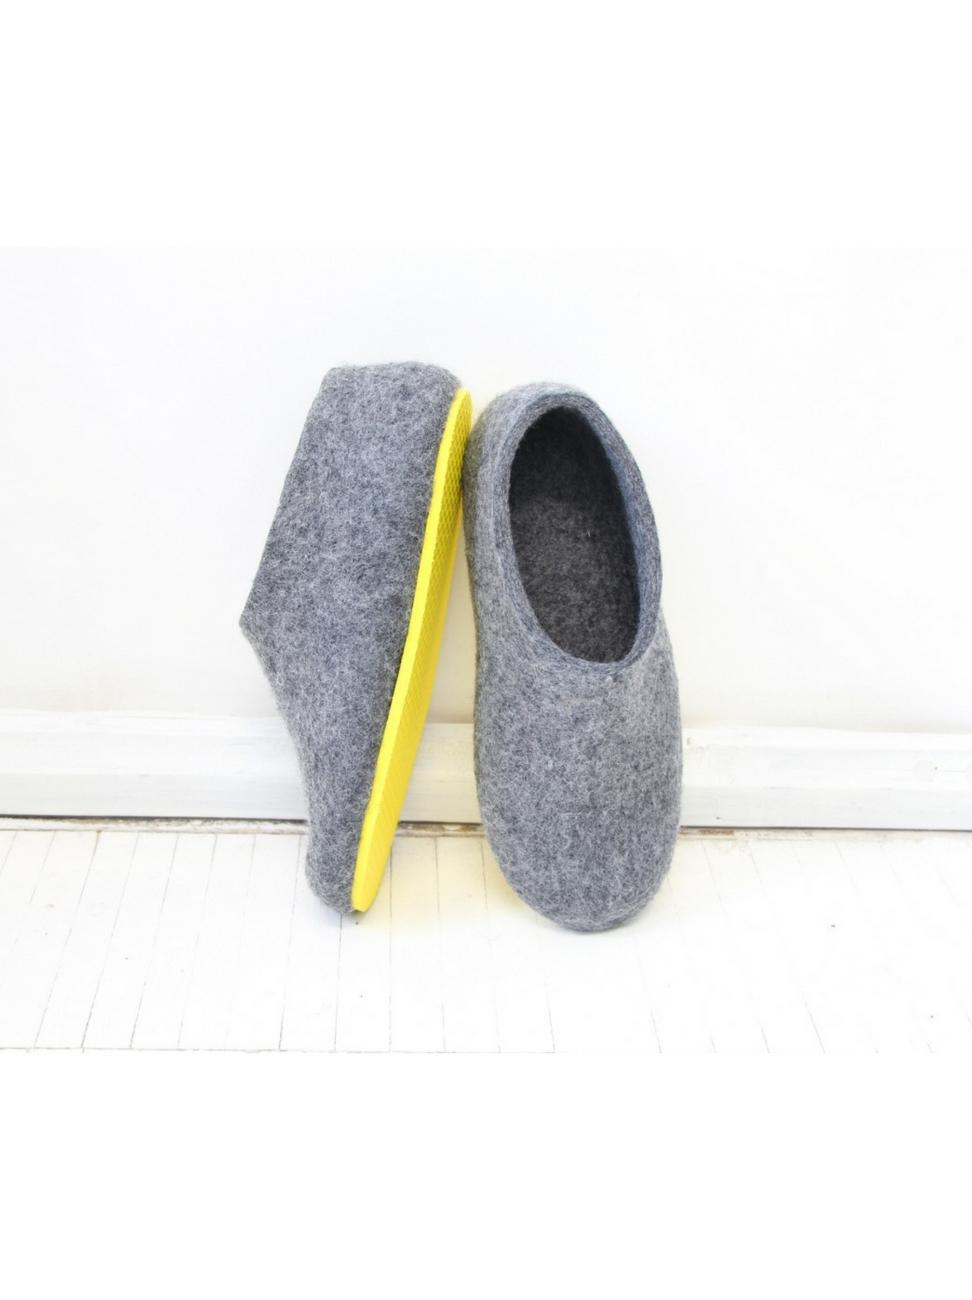 dfcf139fdcc90 Women's Felt House Shoes Grey Minimalist — Luxury wool felt shoes, felt  boots, boiled wool slippers, woolen clogs - custom made at feltforma.com